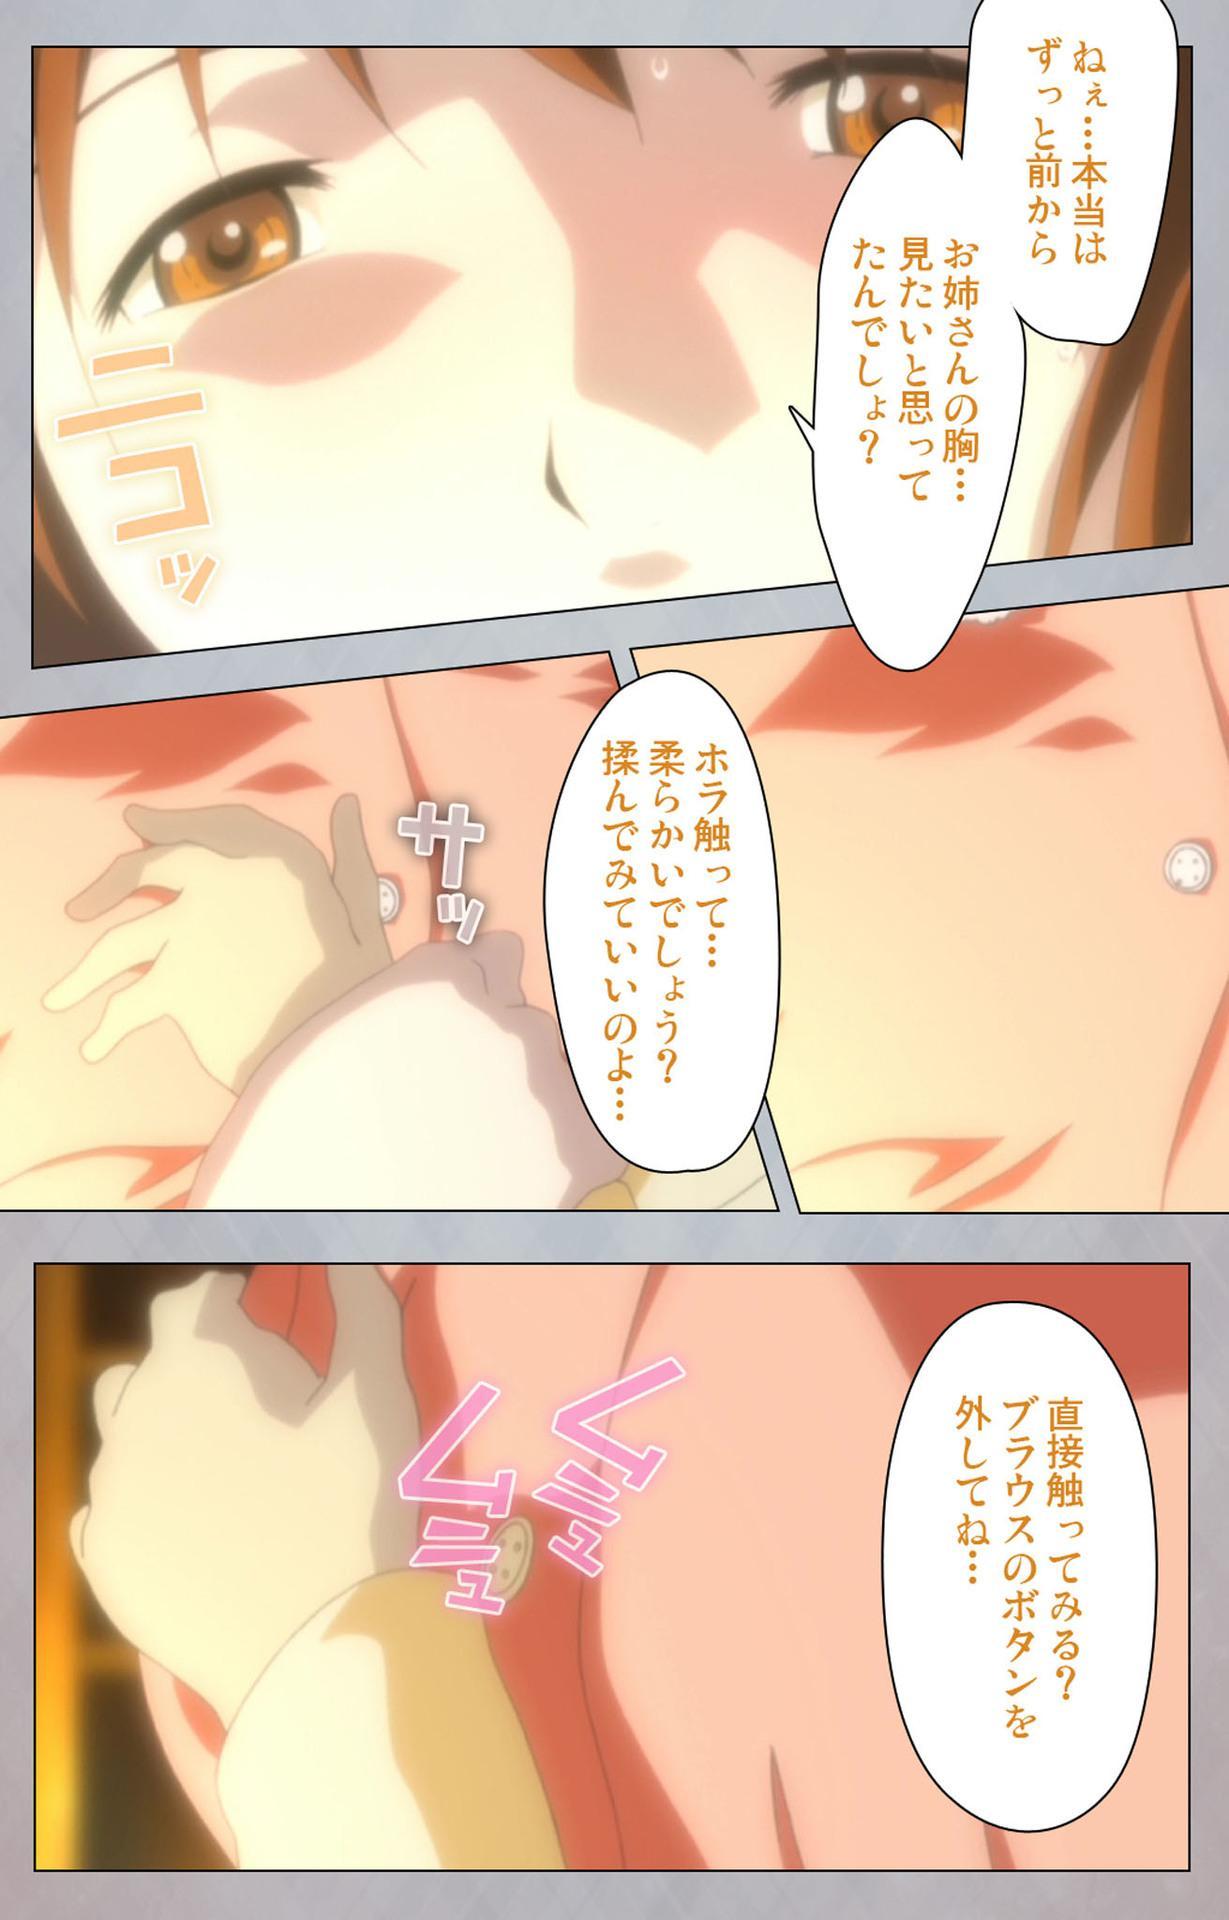 [Digital Works] [Full Color Seijin Ban] Sex Android ~Risou no Onna de Nuite yaru~ Kanzenban 78